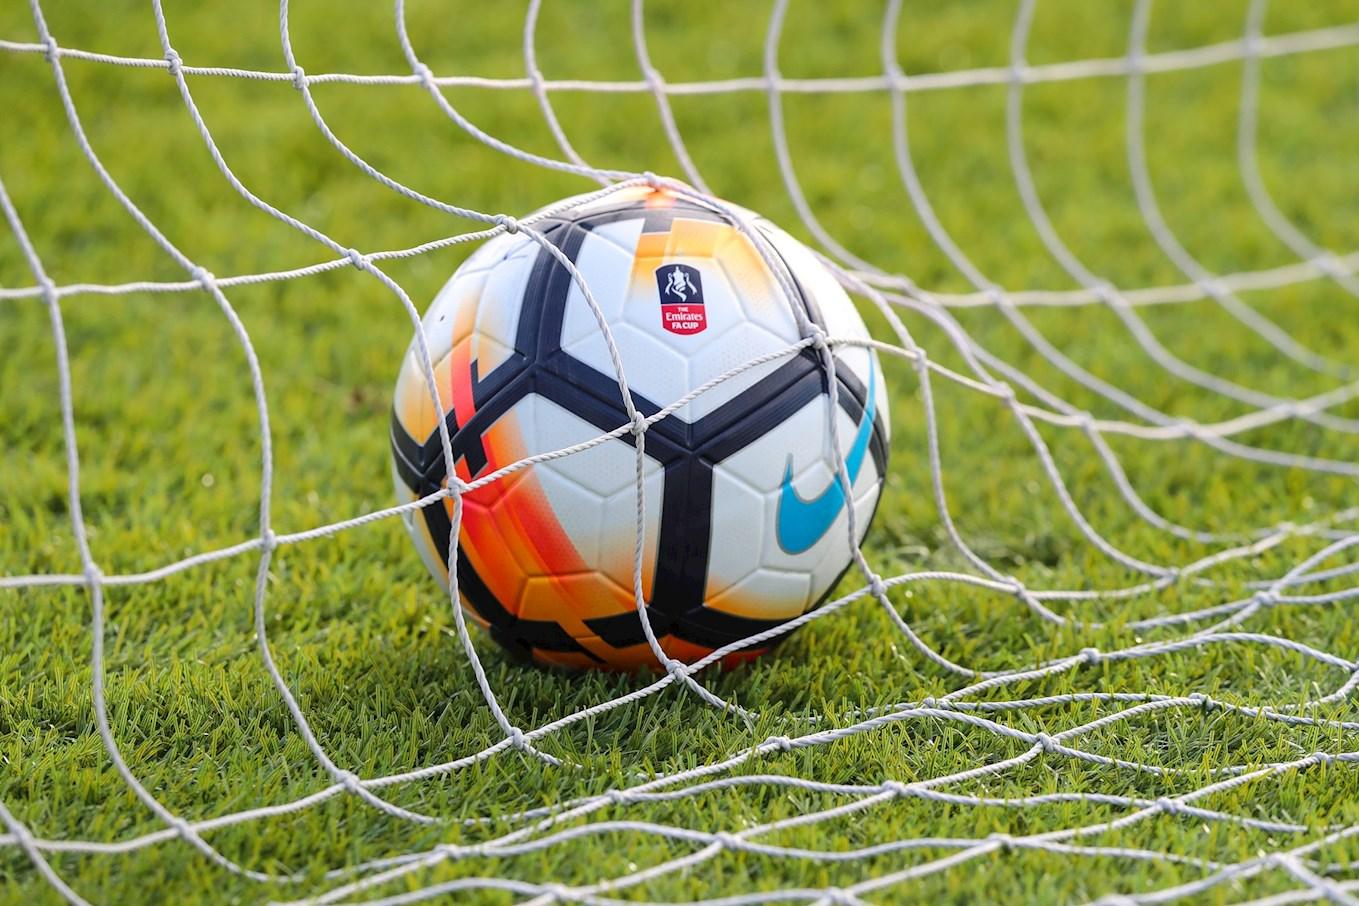 TEAM NEWS | PLYMOUTH ARGYLE (FA CUP) - News - Bradford City